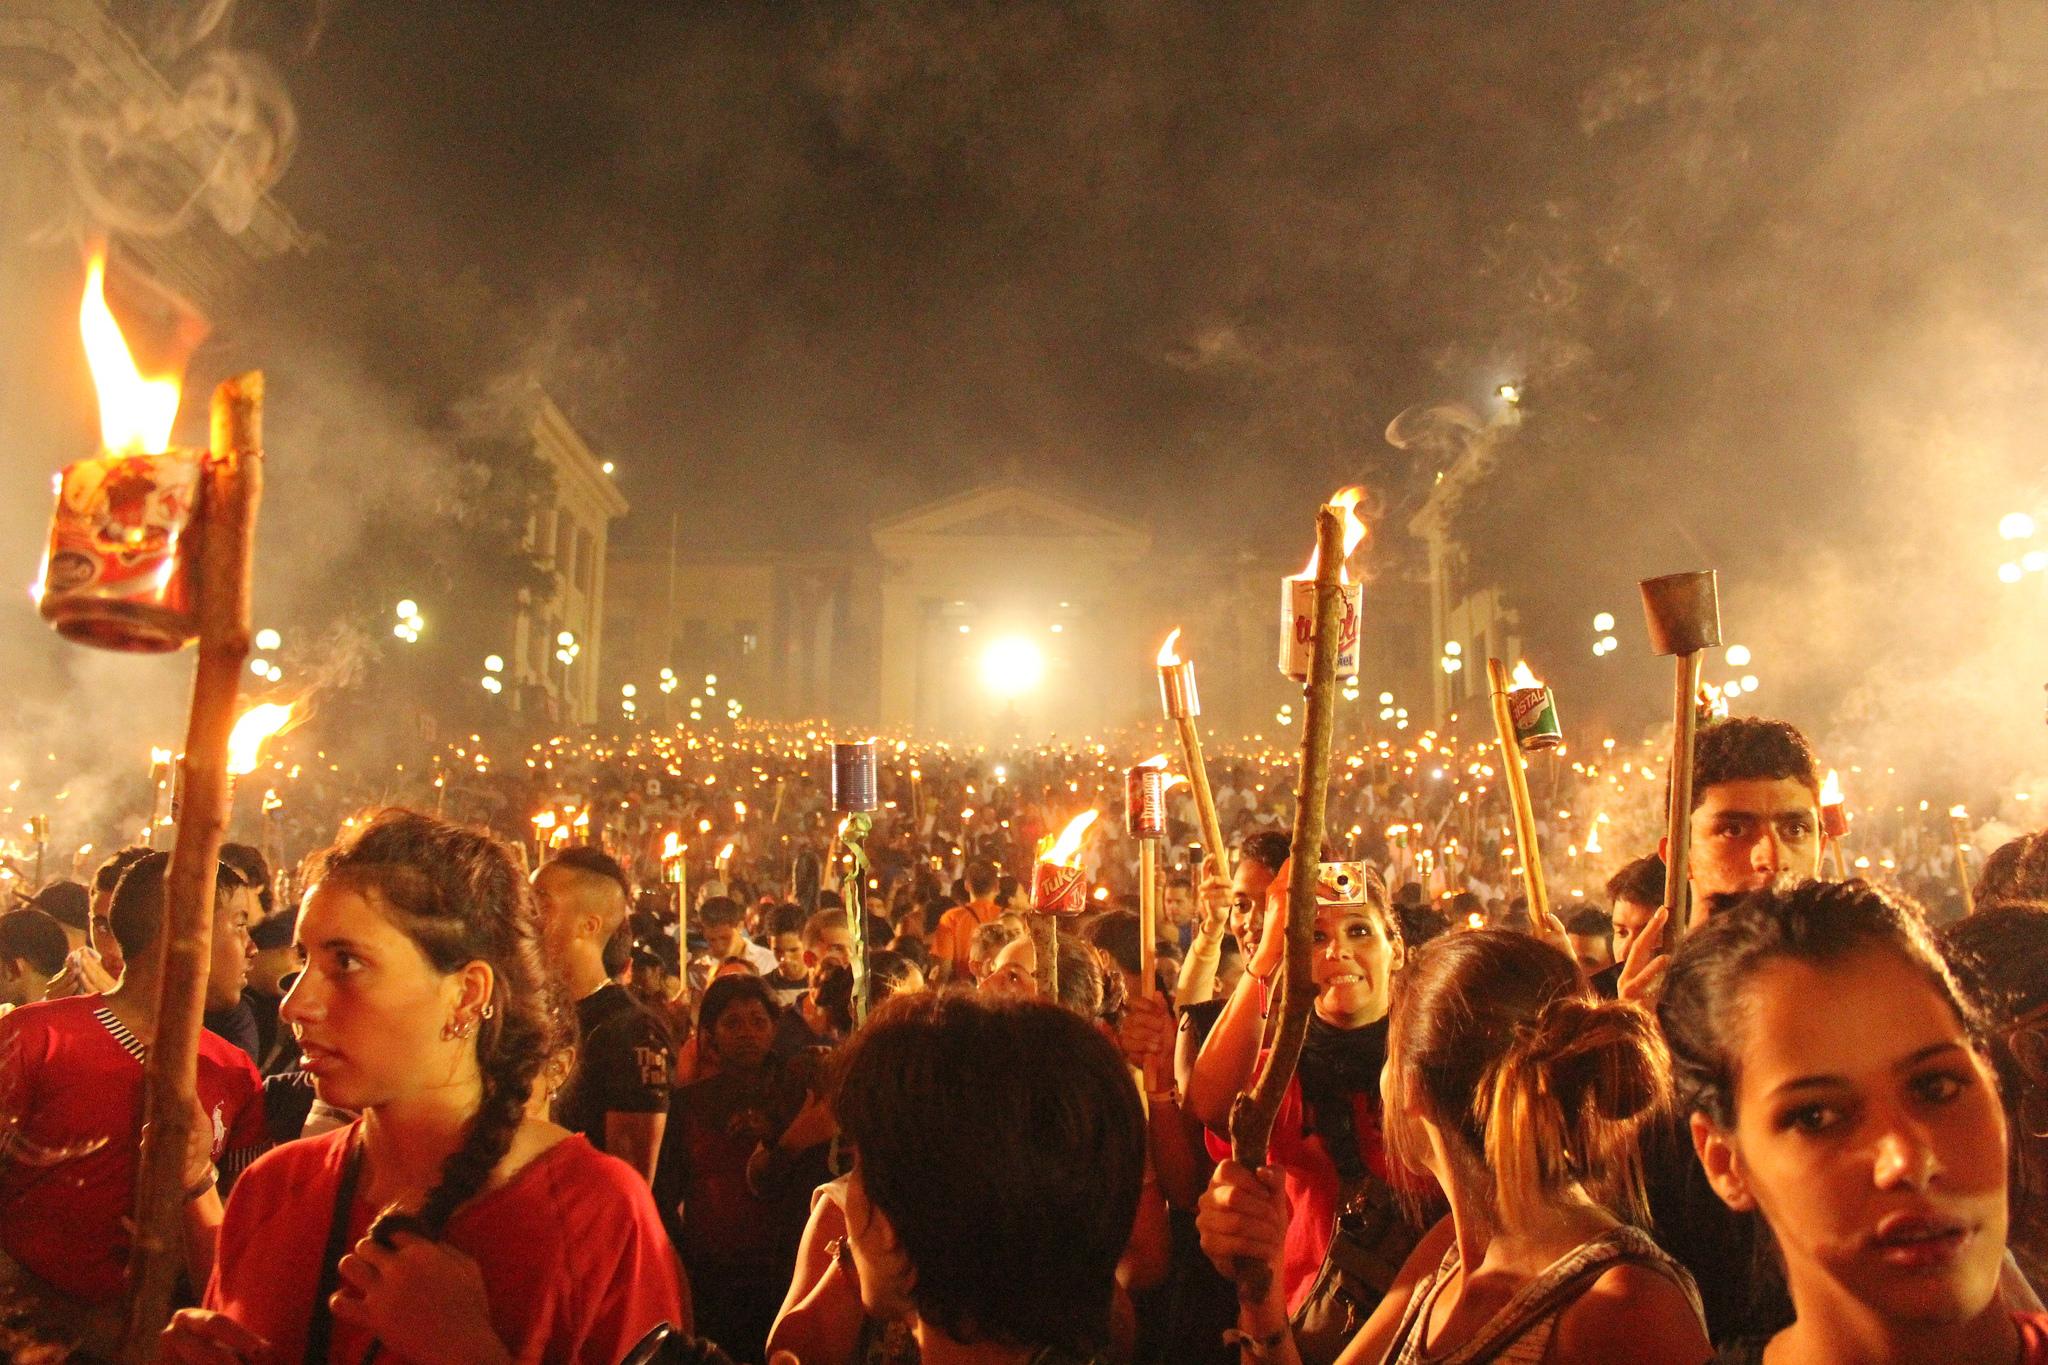 March in tribute to Martí's birth anniversary | © Pablo Spekuljak / Flickr